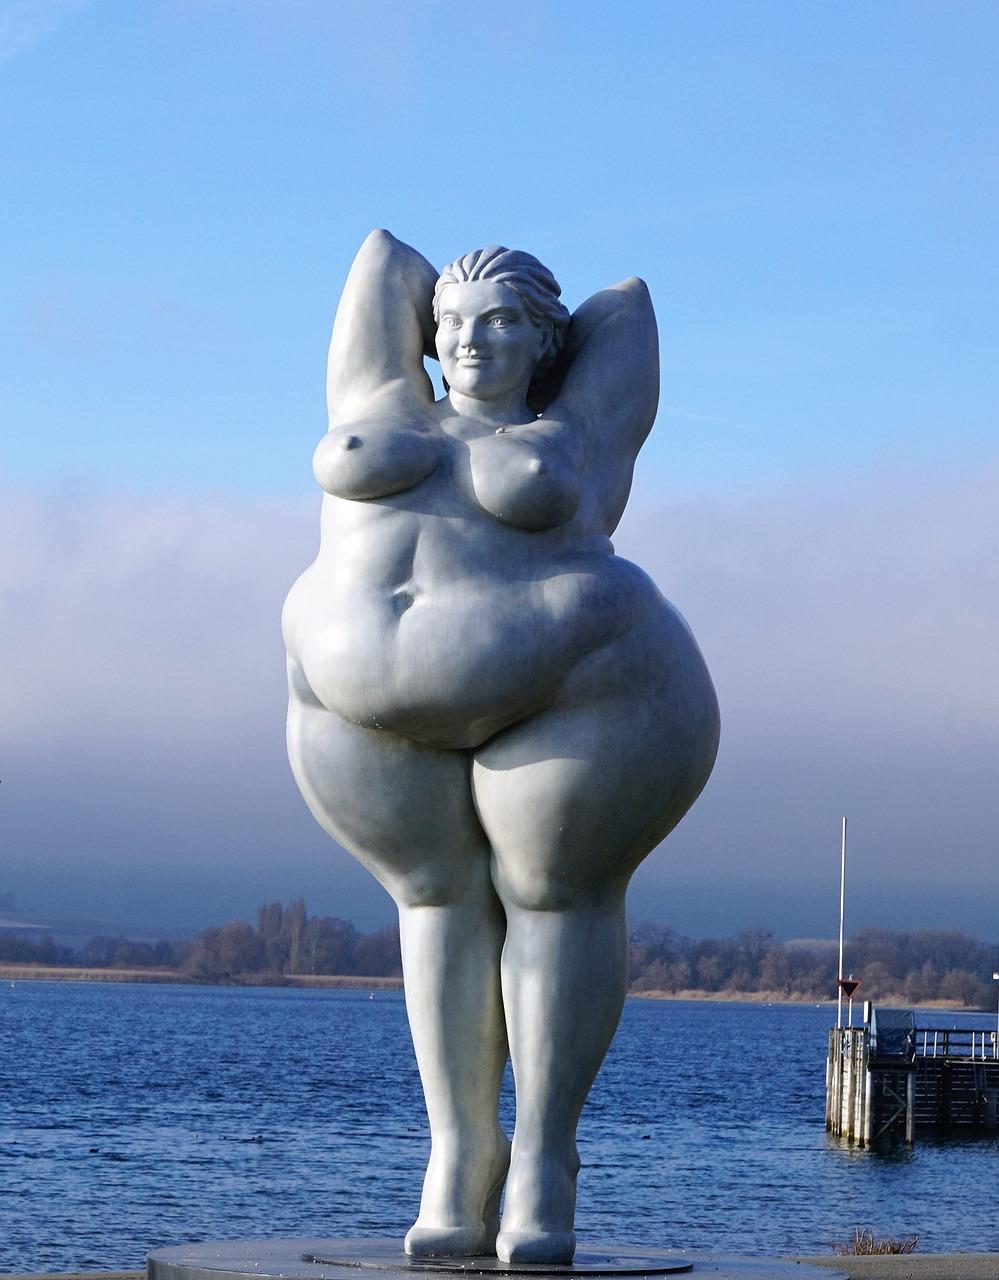 Yolanda szobor Bodeni-tó